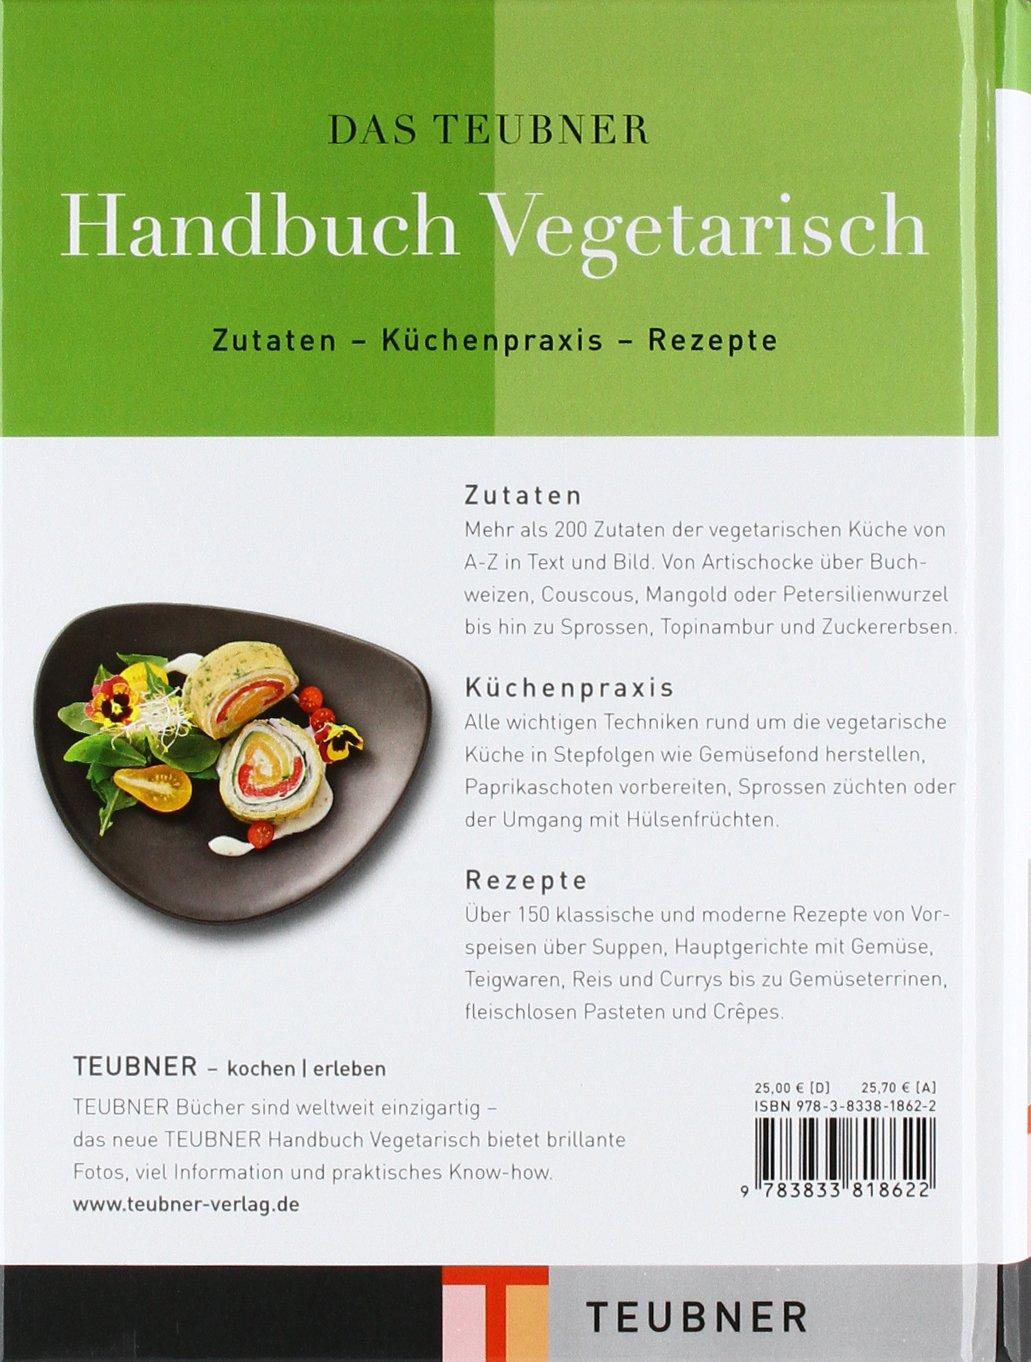 Teubner handbuch vegetarisch zutaten küchenpraxis rezepte teubner handbücher amazon de claudia bruckmann cornelia klaeger bücher